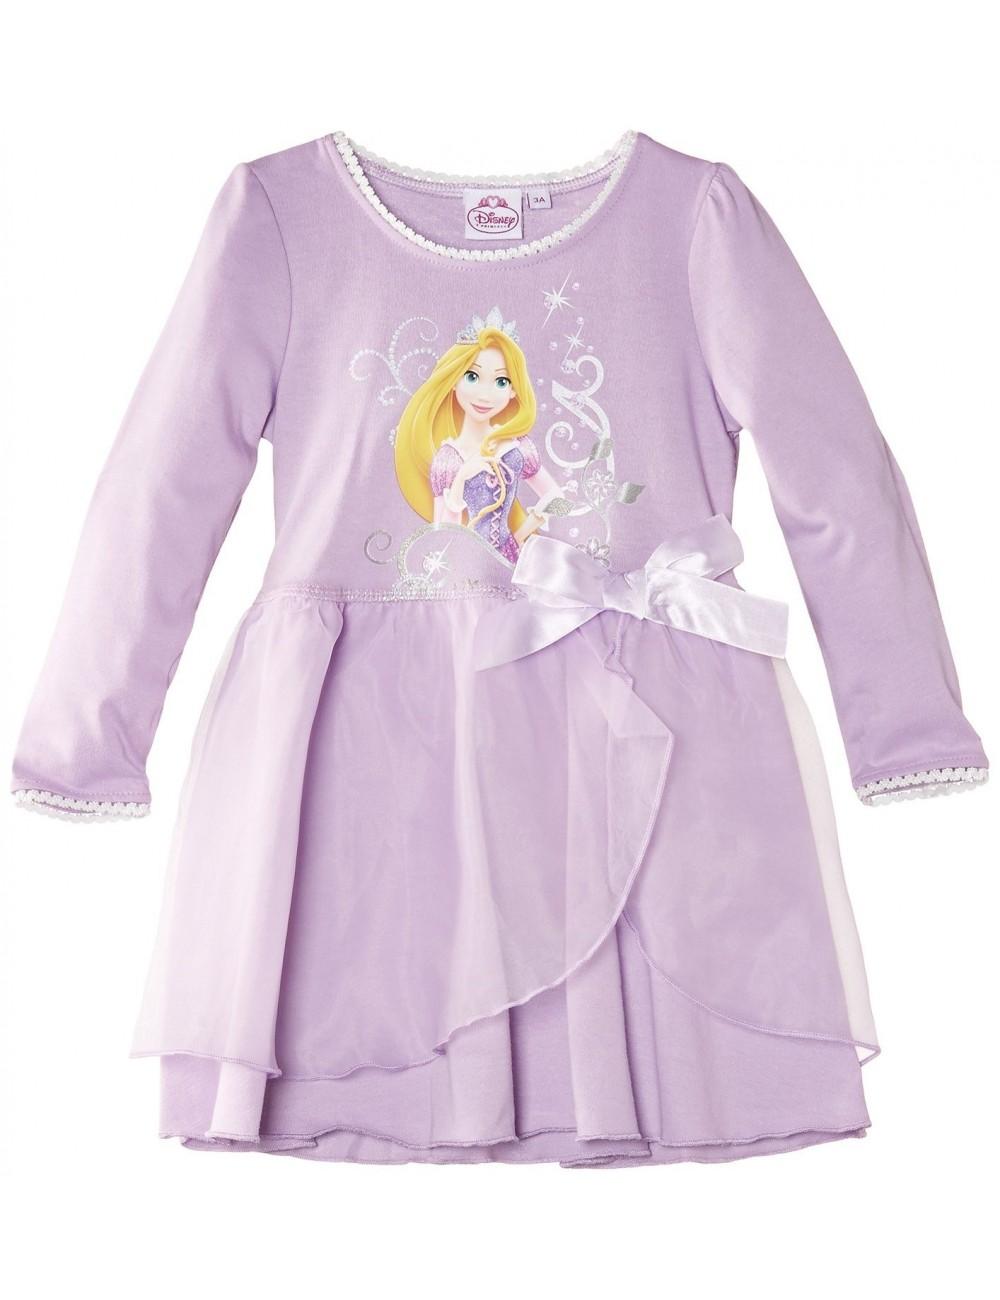 Camasa de noapte copii, Disney Rapunzel